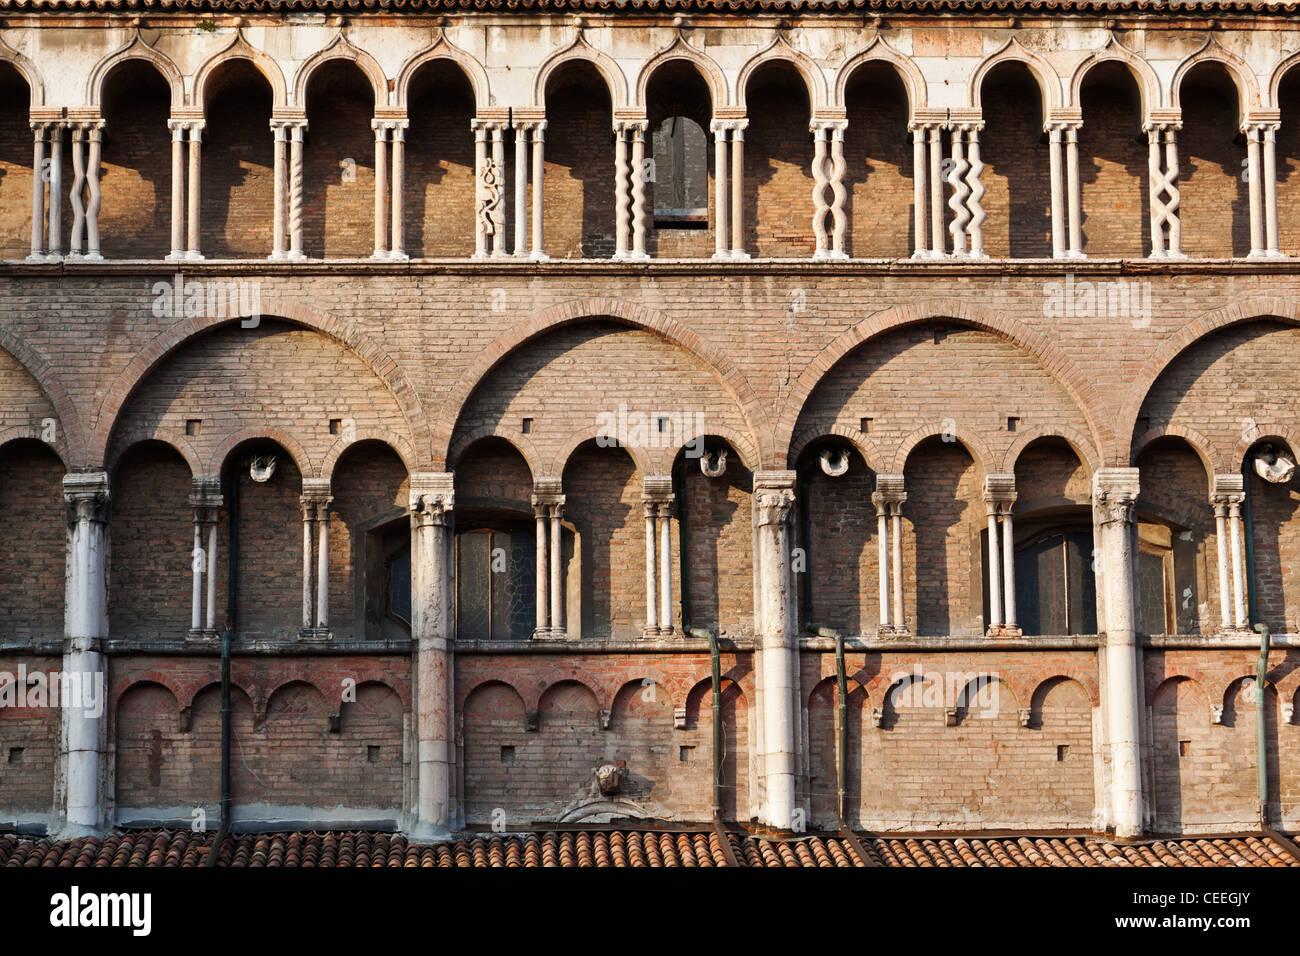 Säulen an Hauptfassade der Kathedrale Duomo Ferrara Emilia-Romagna Italien Stockfoto